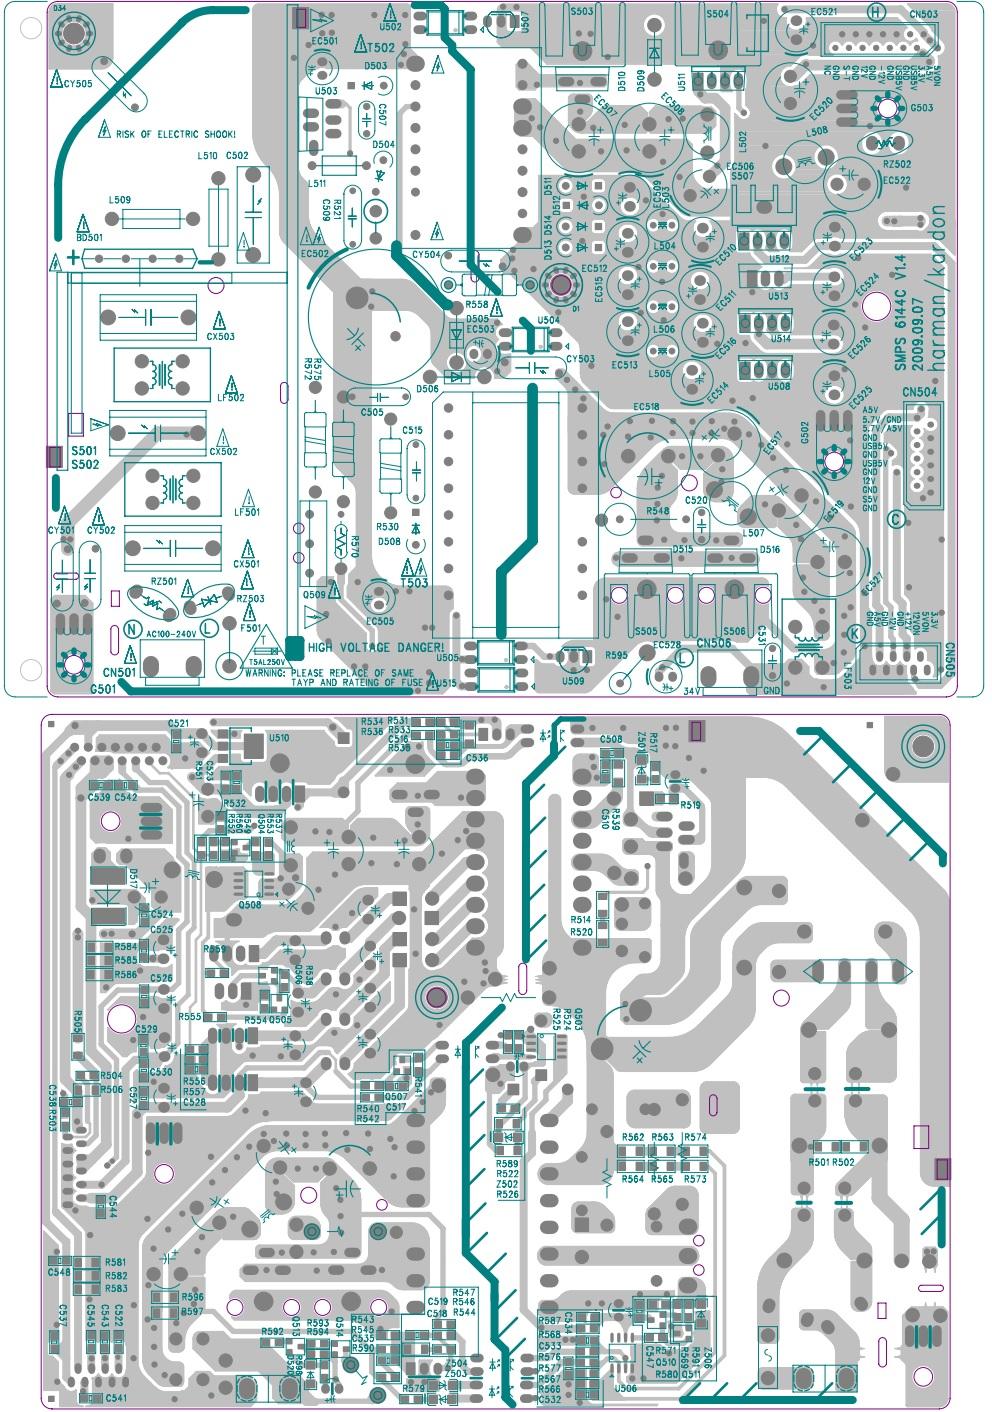 harman/kardon HK HS 2X0/230 - SMPS and Power Amplifier Circuit ...